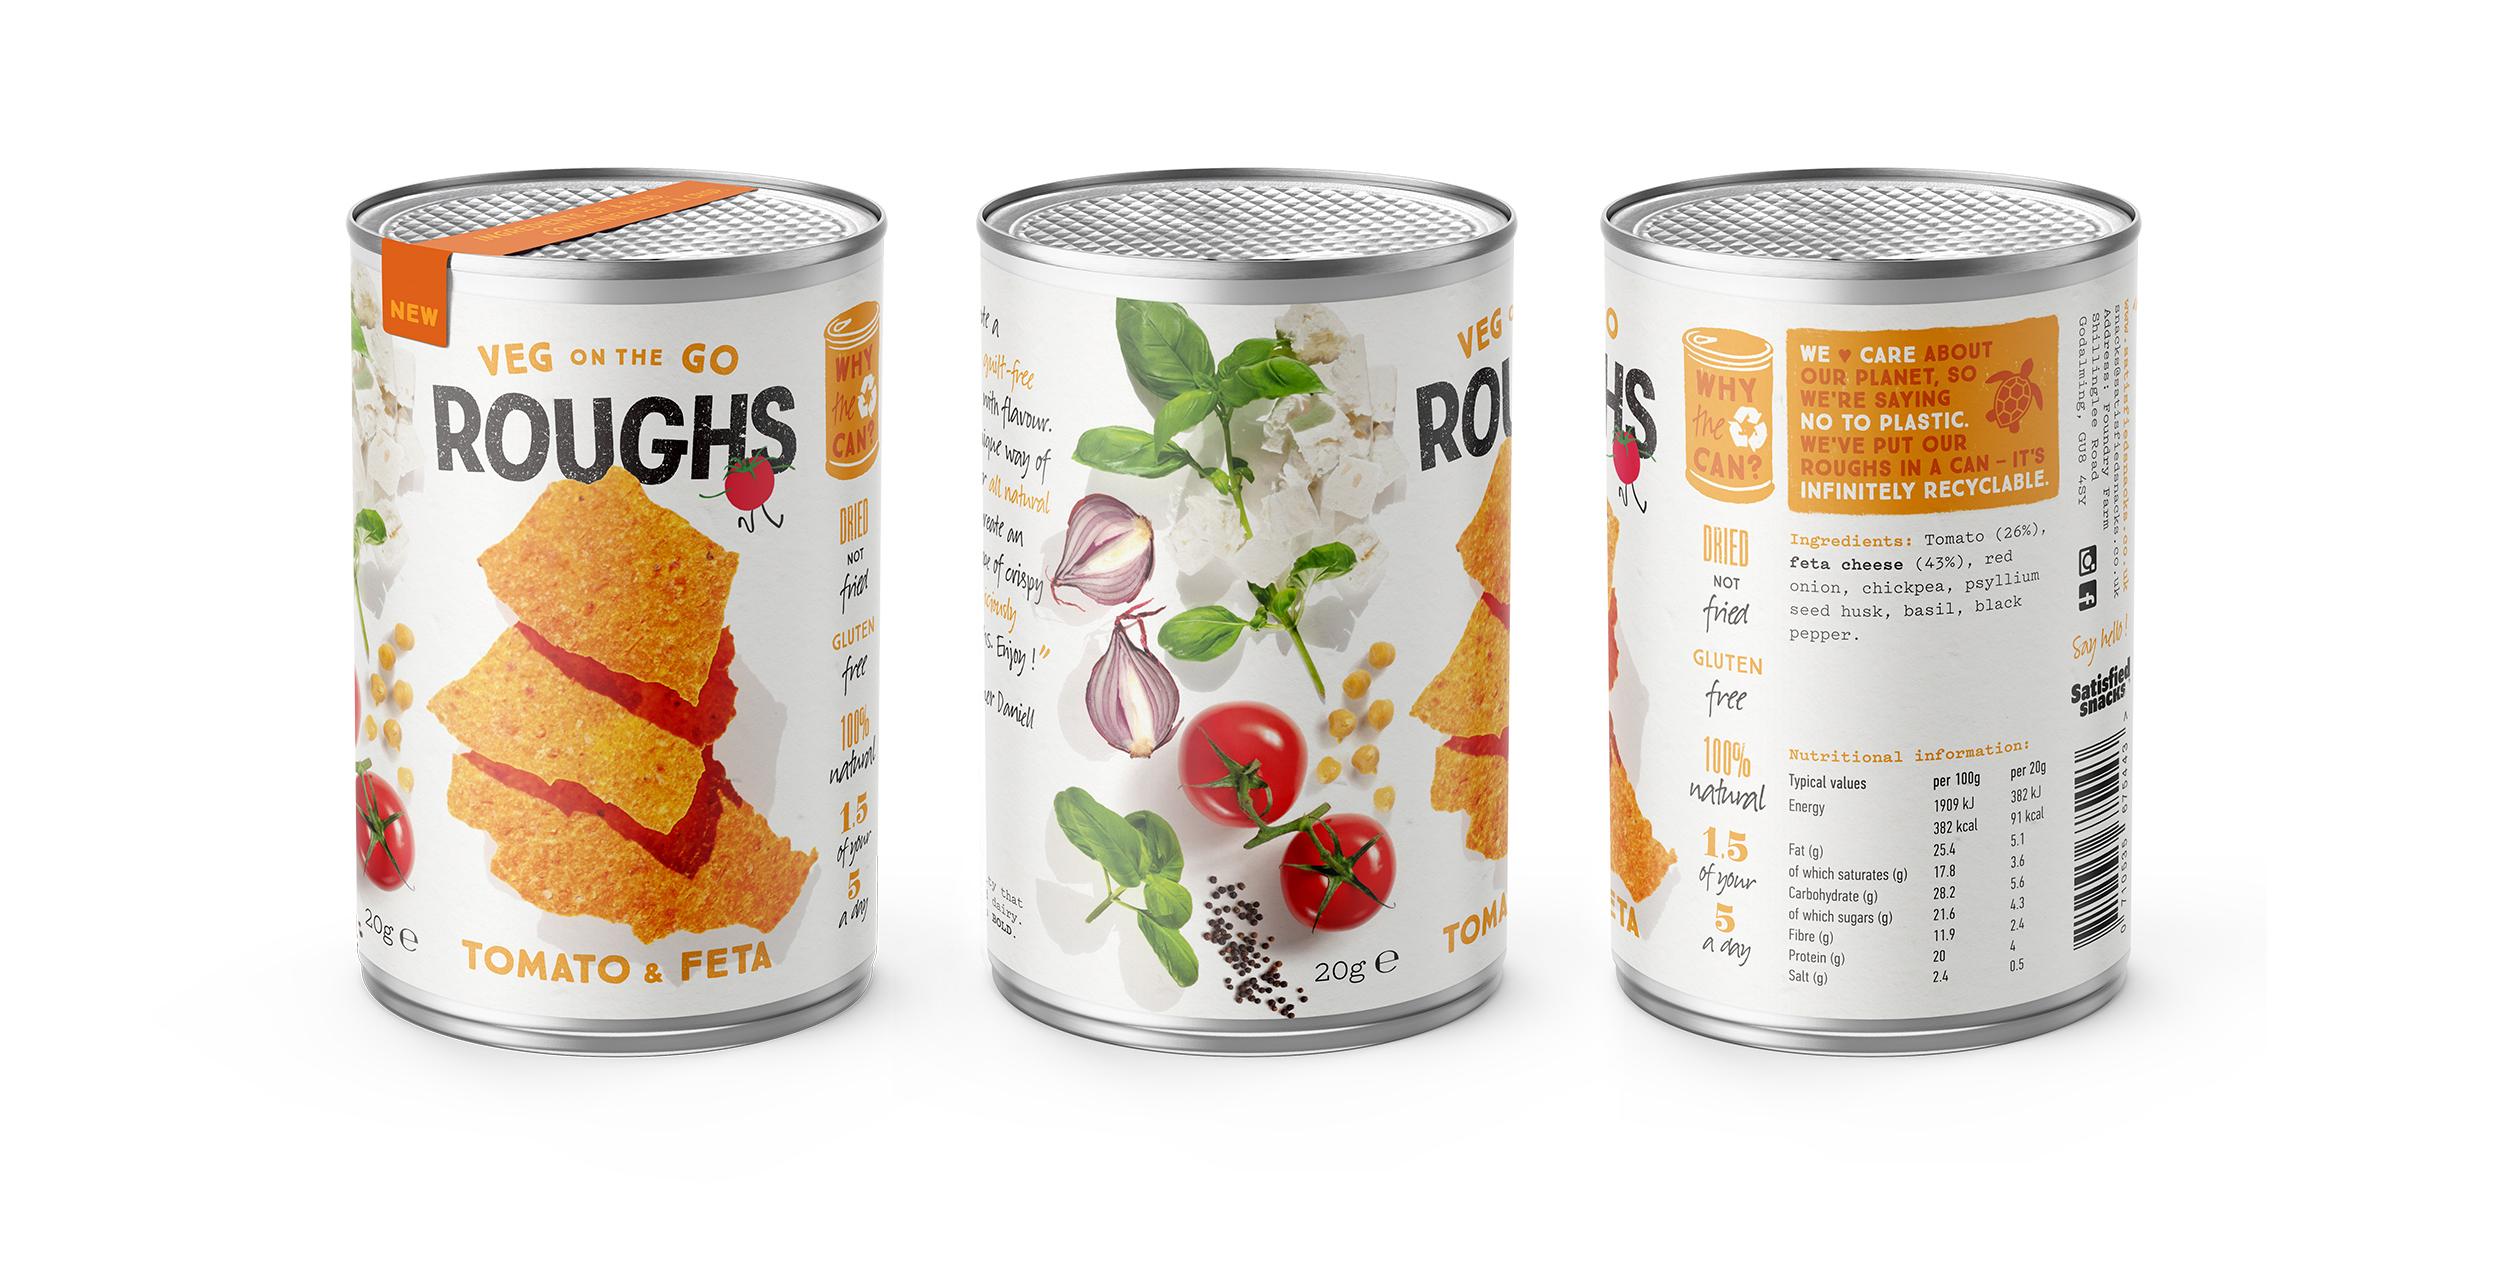 Eco-Packaging-design-London-sustainable-plastic-free-snacks-zero-waste-galia-rybitskaya-a-ya-design-satisfied-snacks-roughs-tomato-feta-veg.jpg